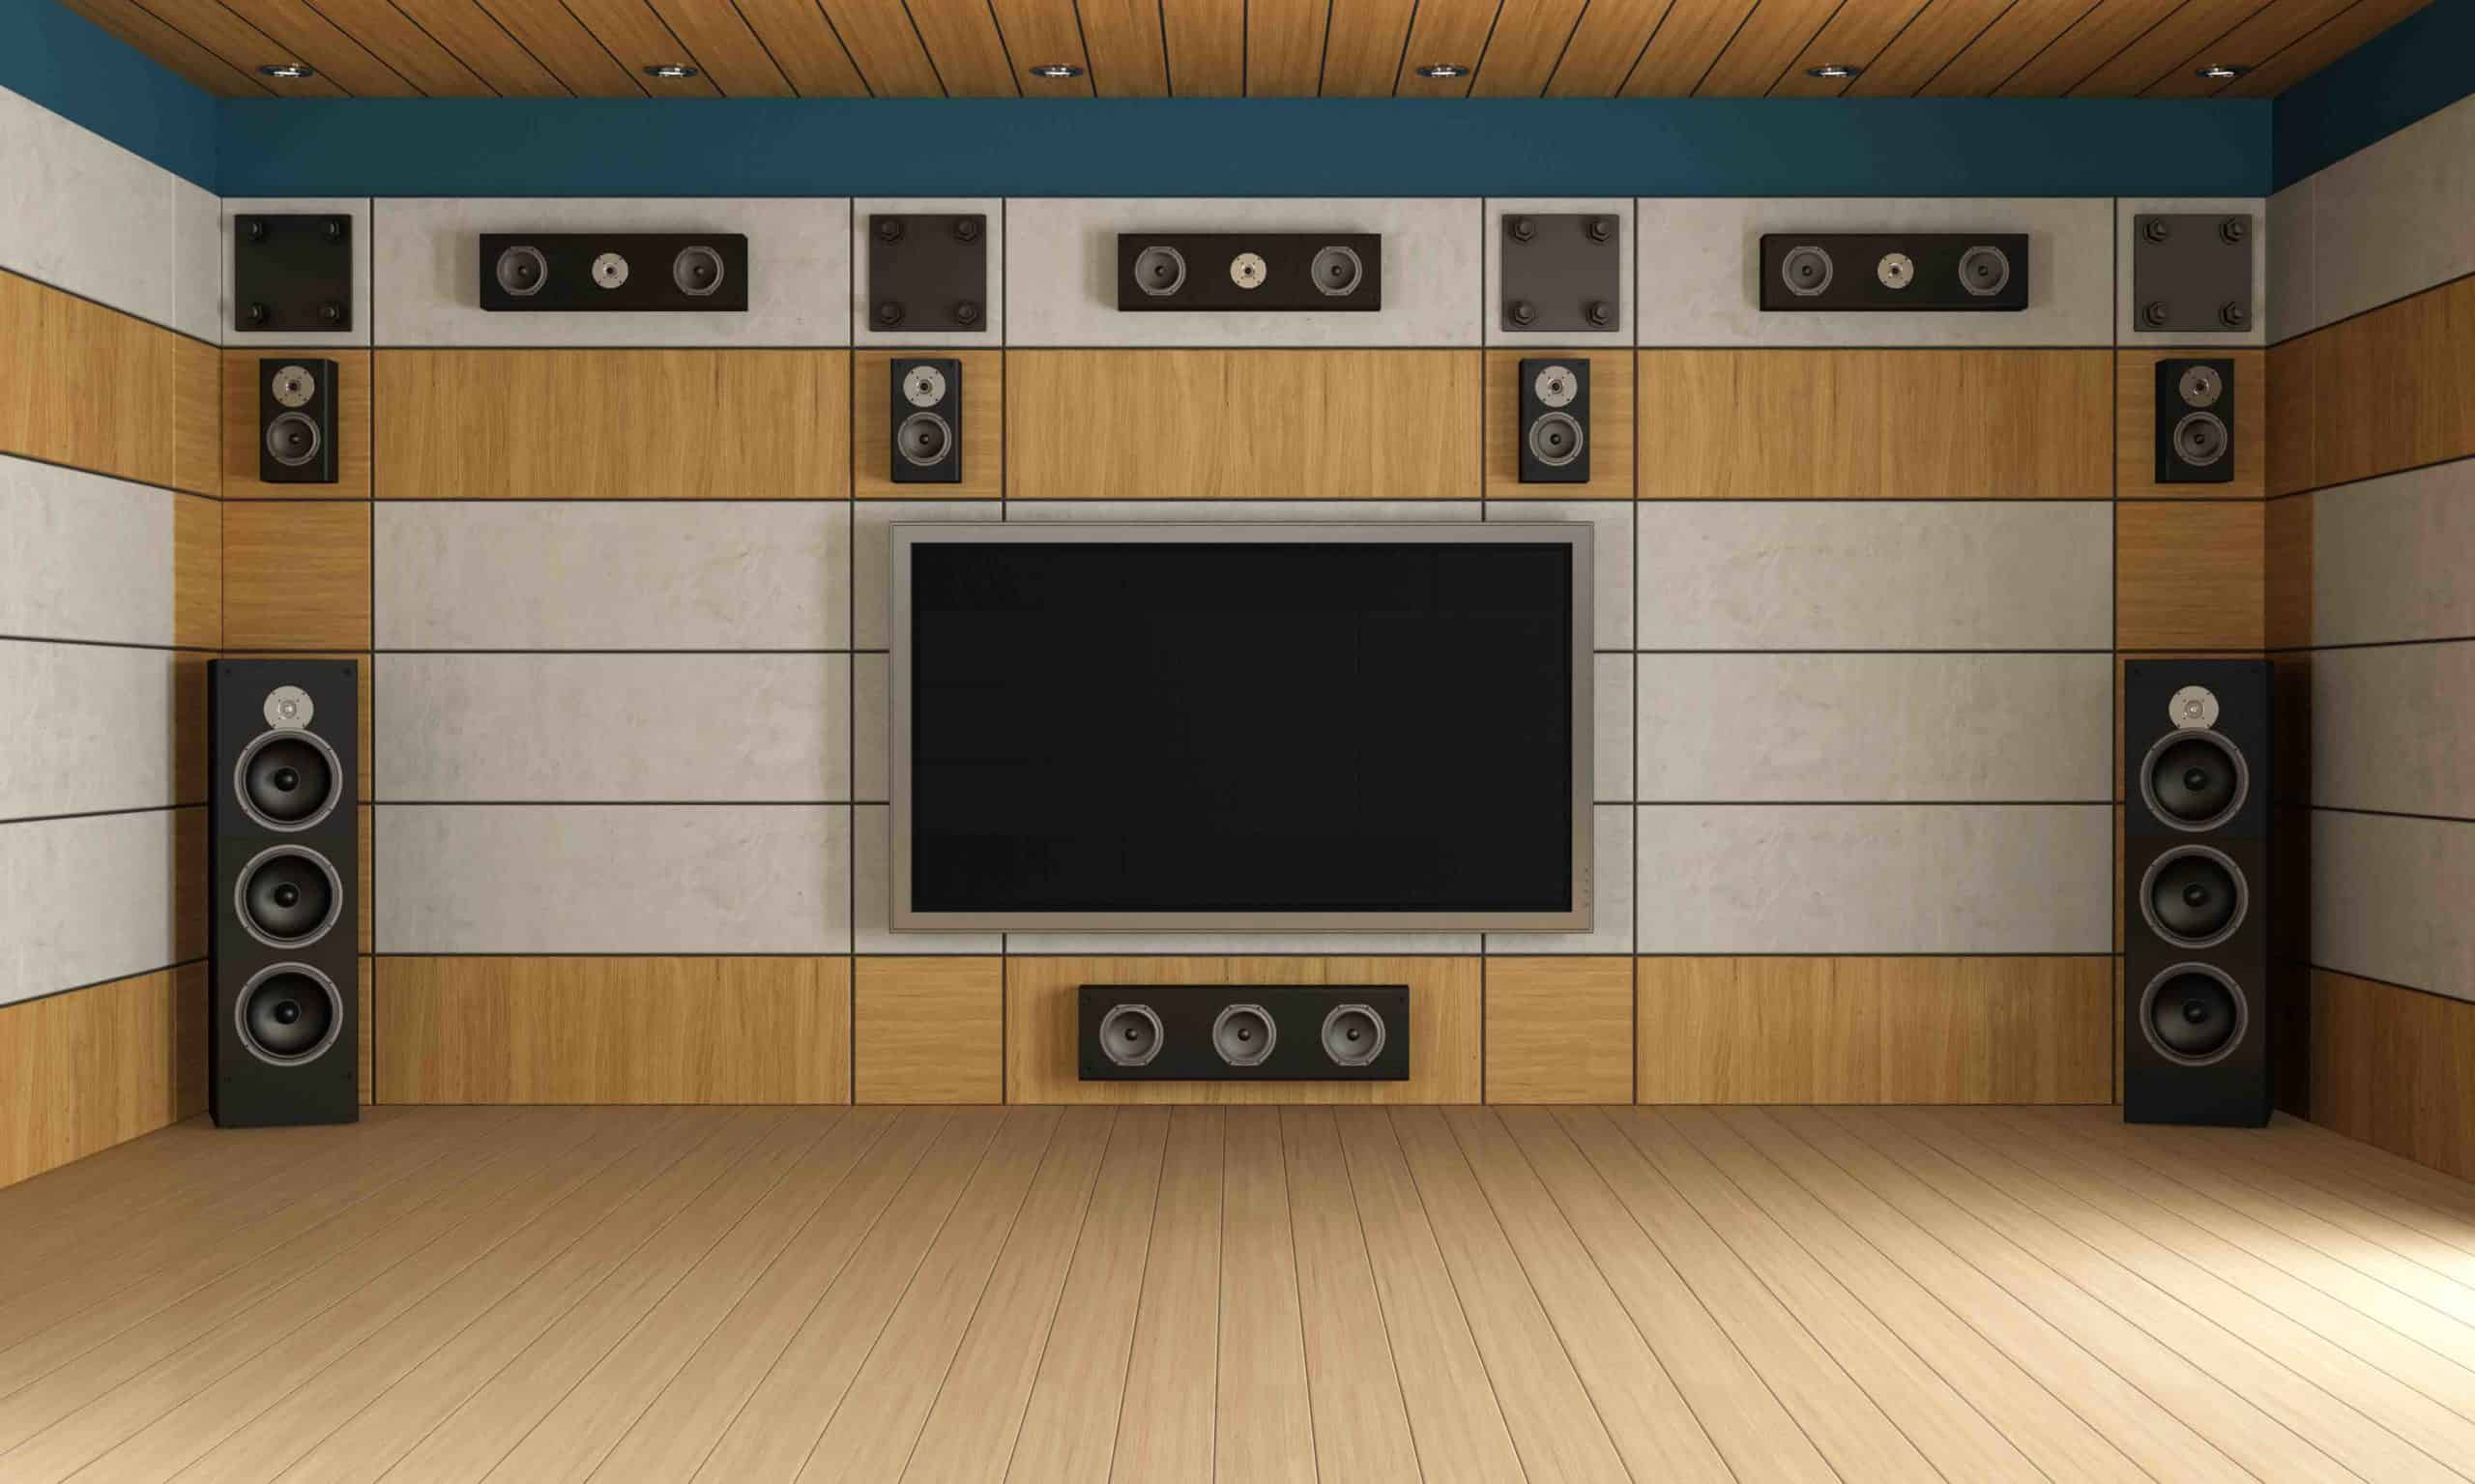 Reno Rocket Basement Renovation Idea - Basement Home heater room